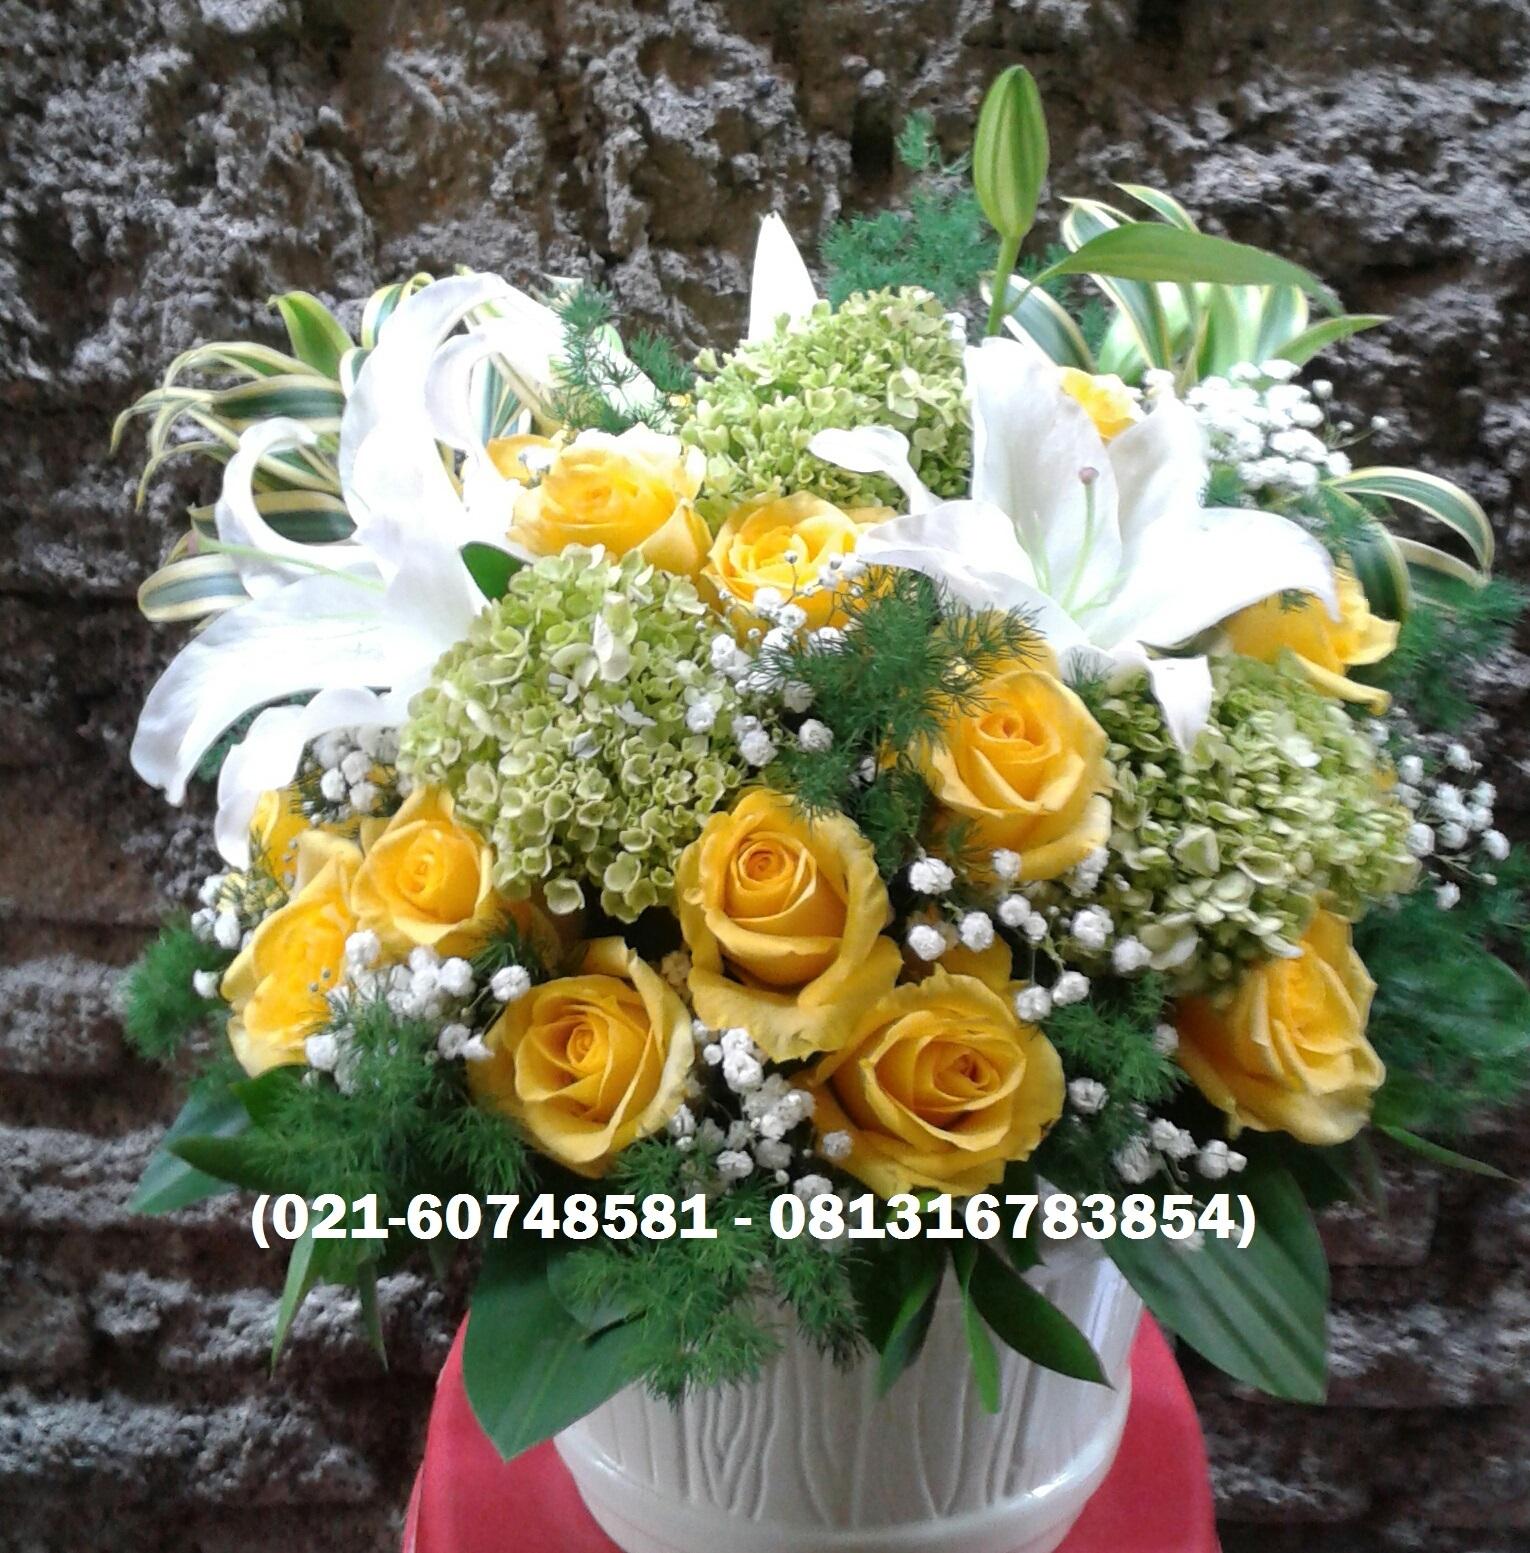 Rusty Florist Jakarta Online Flower Shop Rangkaian Bunga Meja Makan